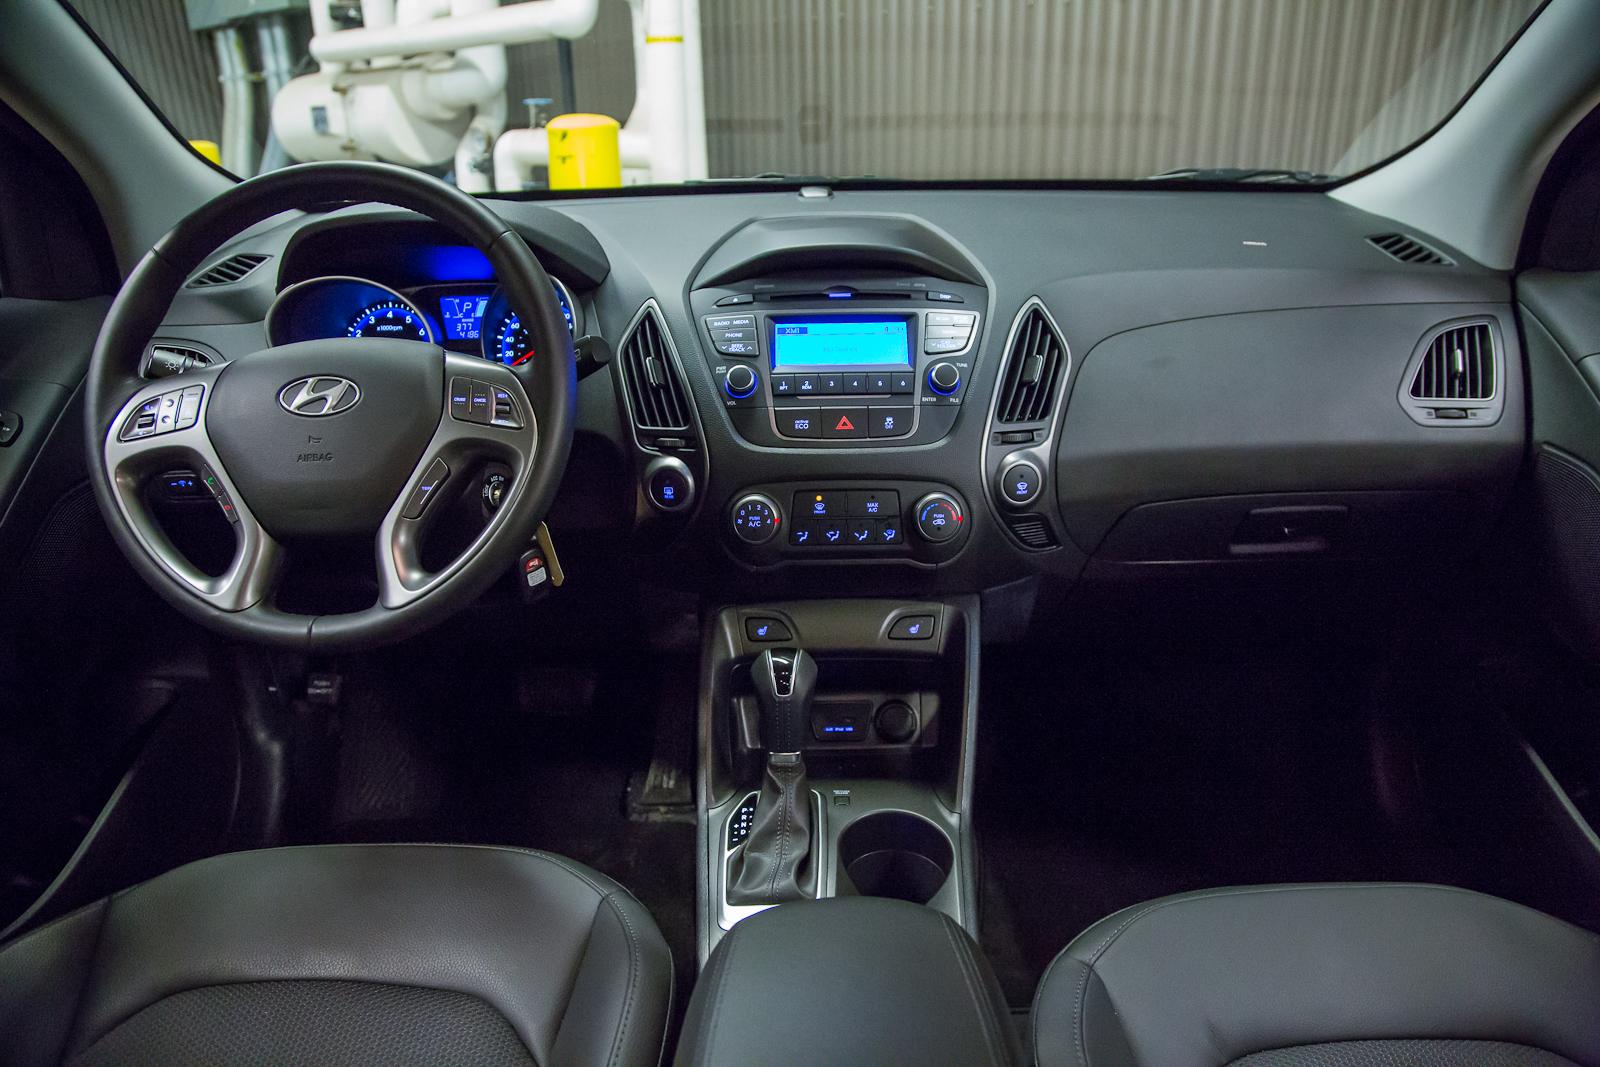 2014 Hyundai Tucson GLS AWD  Review  Trucks And SUVs